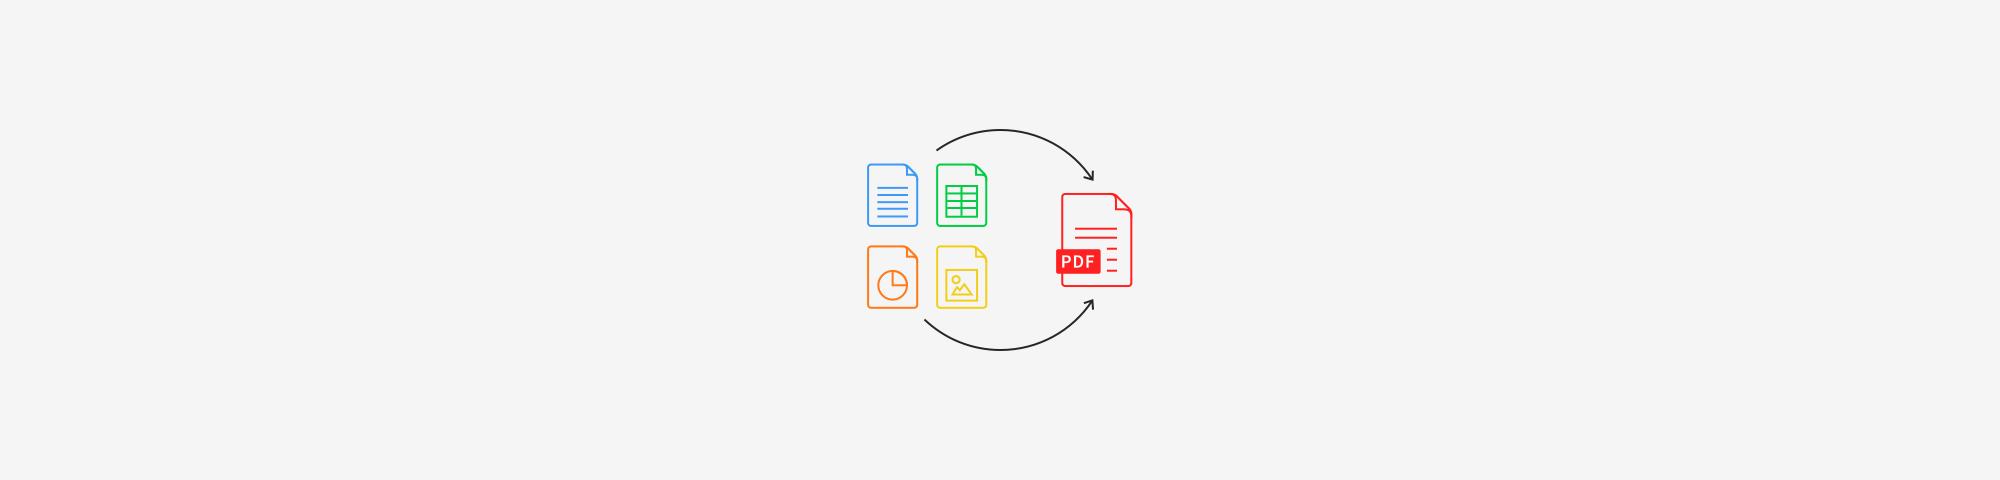 convert-file-to-pdf-2x